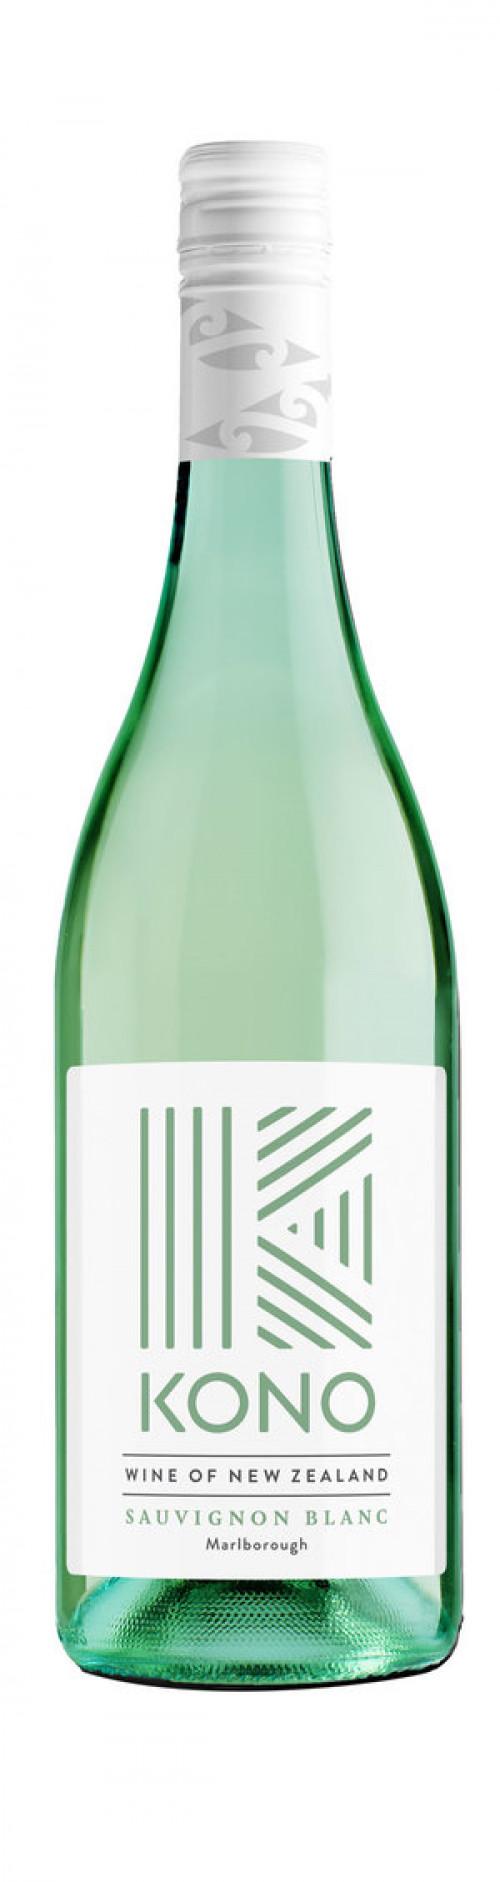 2020 Kono Sauvignon Blanc 750ml